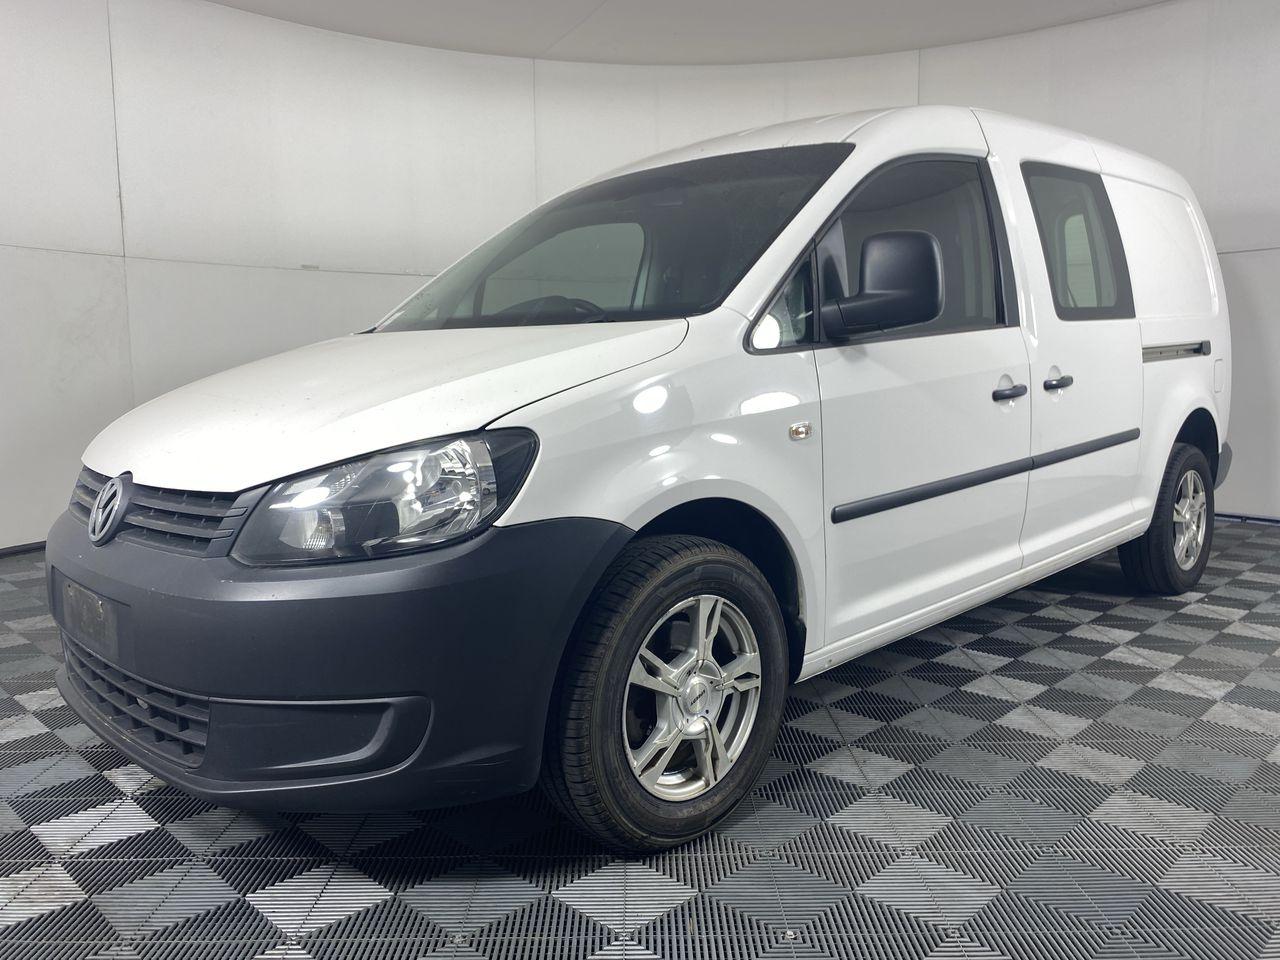 2013 Volkswagen Caddy TSI175 MAXI Van (Service History)